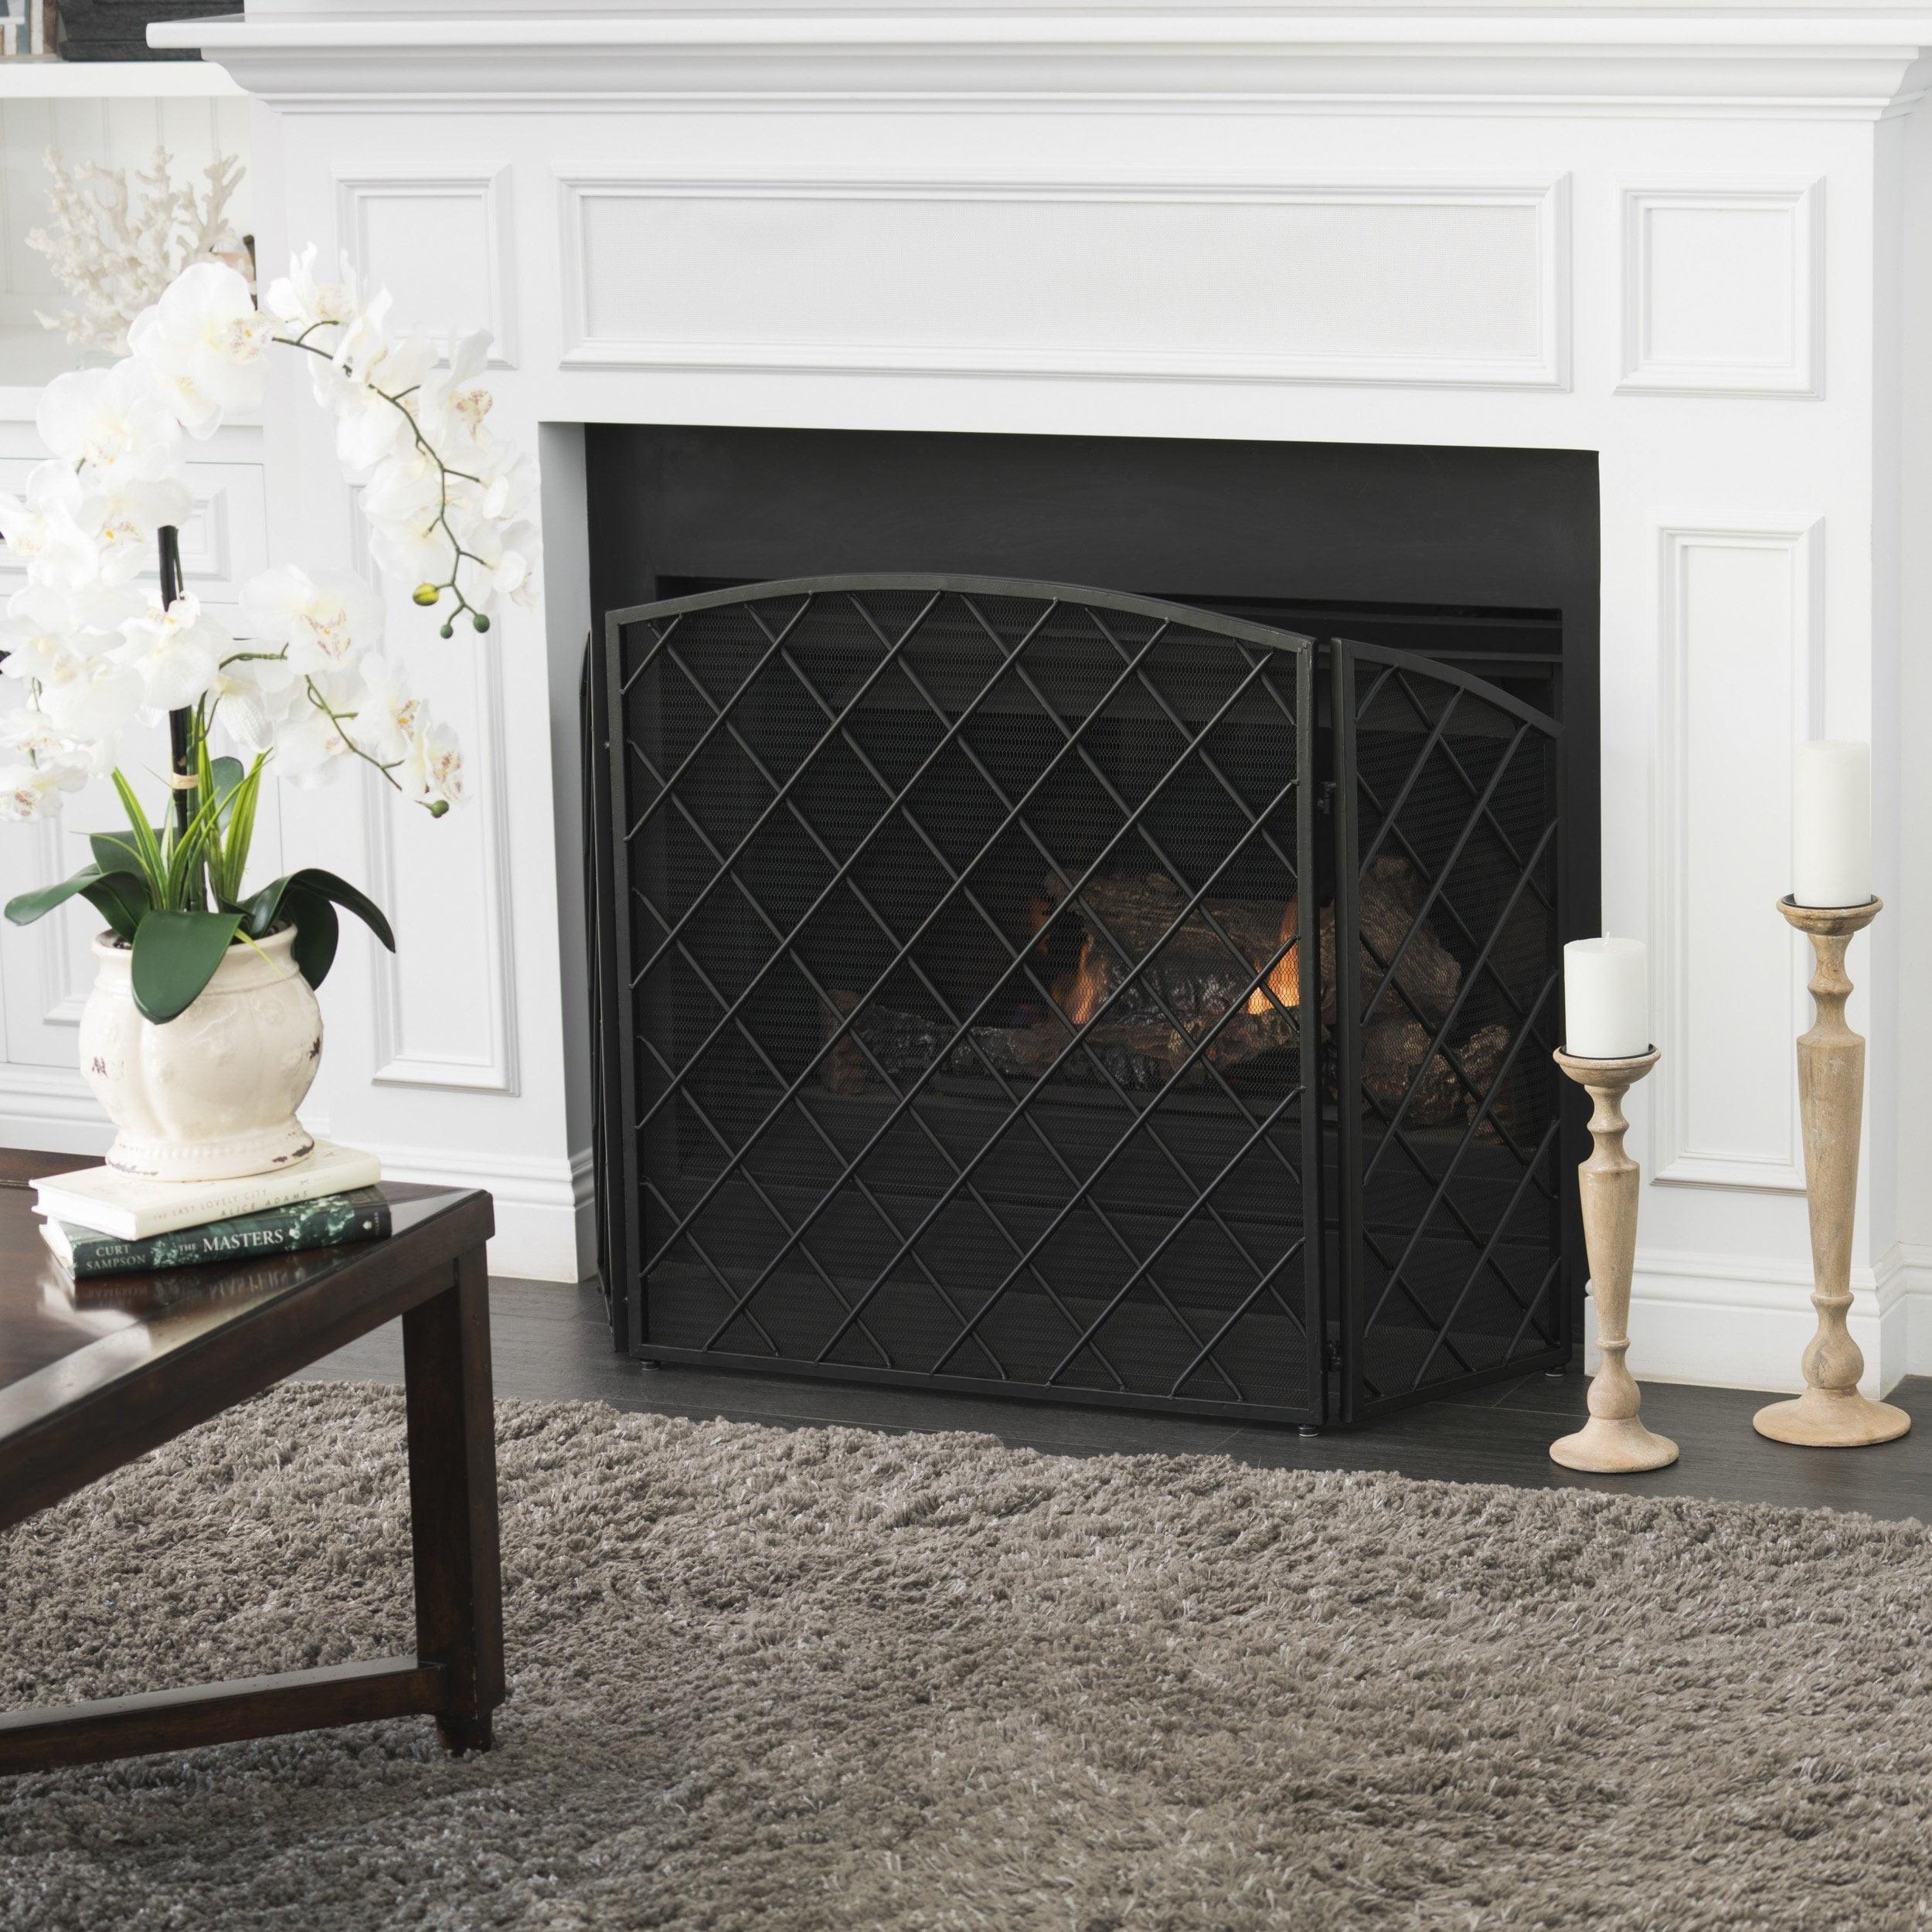 Angella 3 Panelled Iron Fireplace Screen, Gold